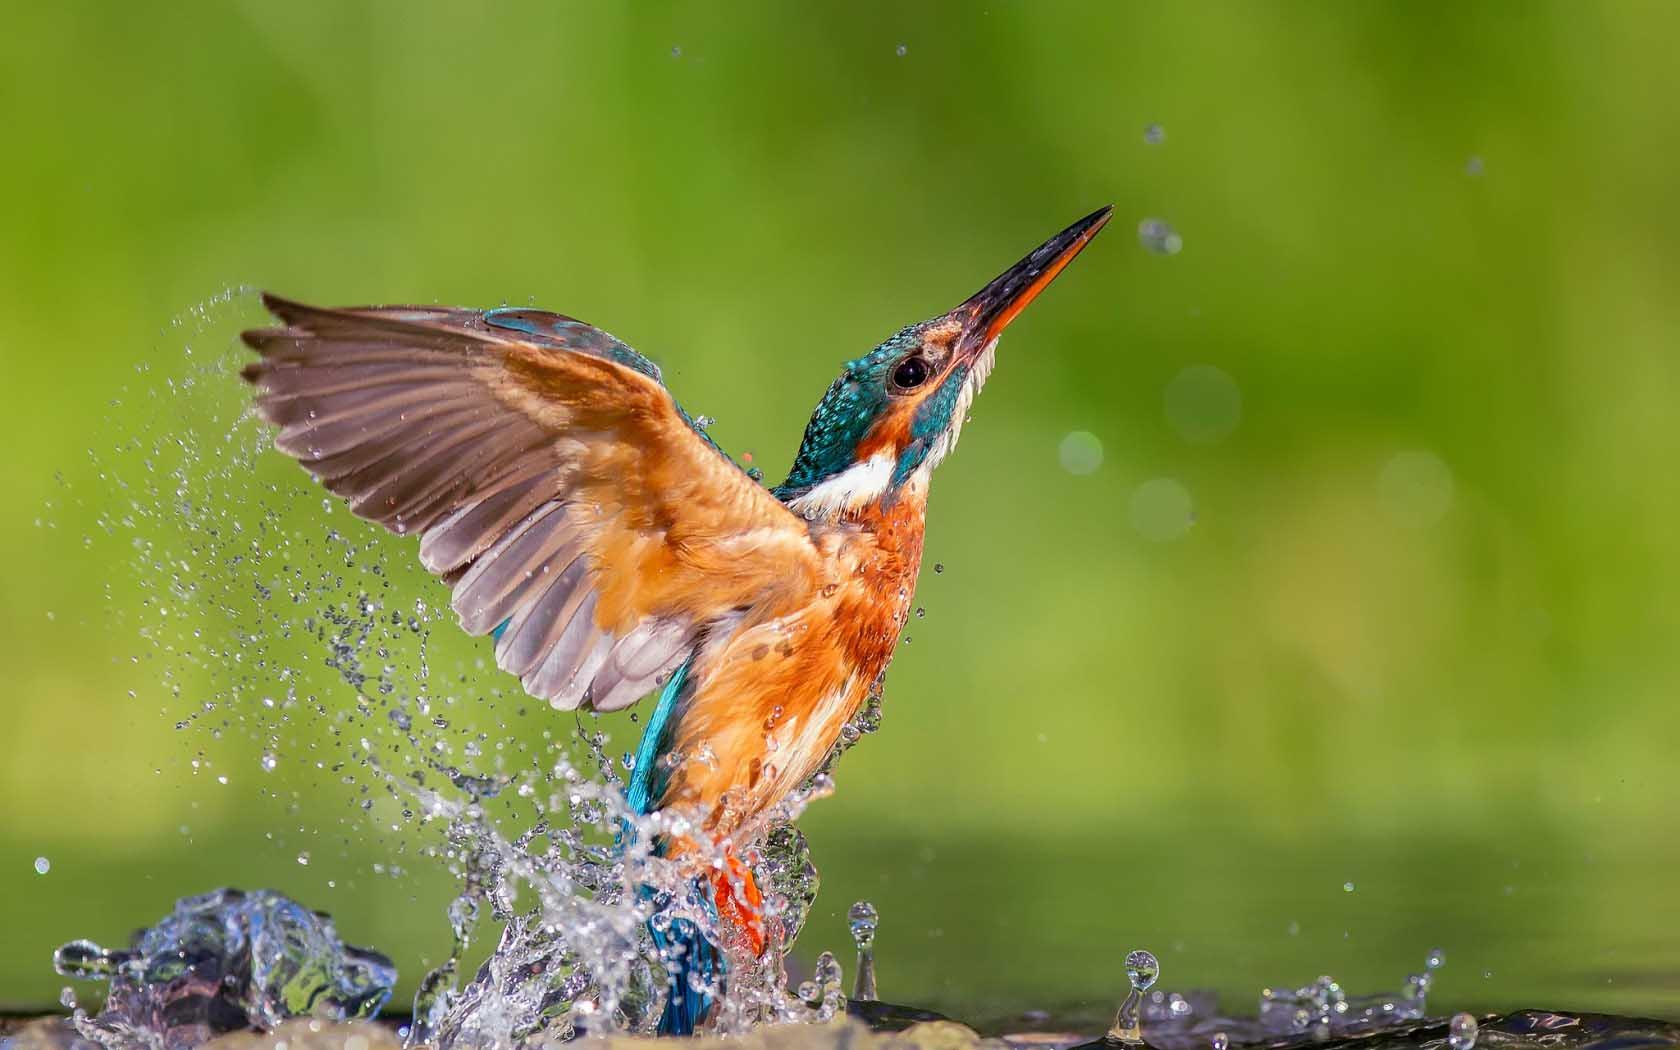 Kingfisher wallpapers wallpaper cave - Animal and bird hd wallpaper ...